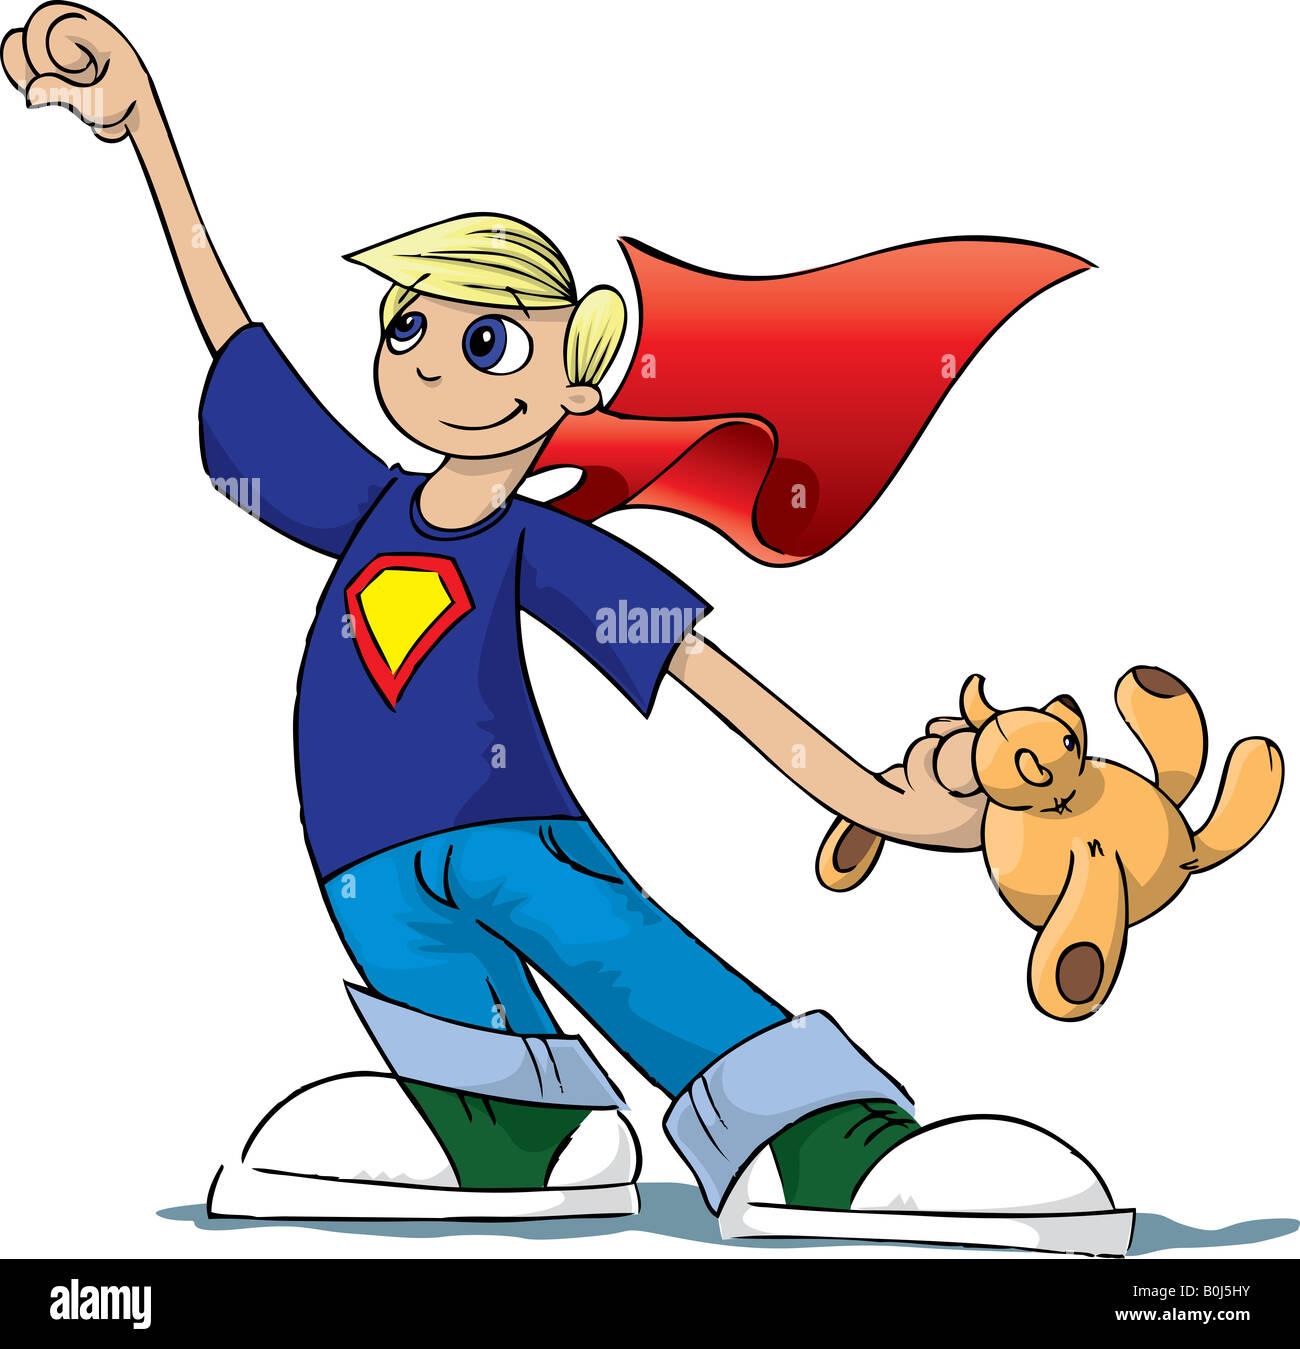 Boy Hero - Stock Image